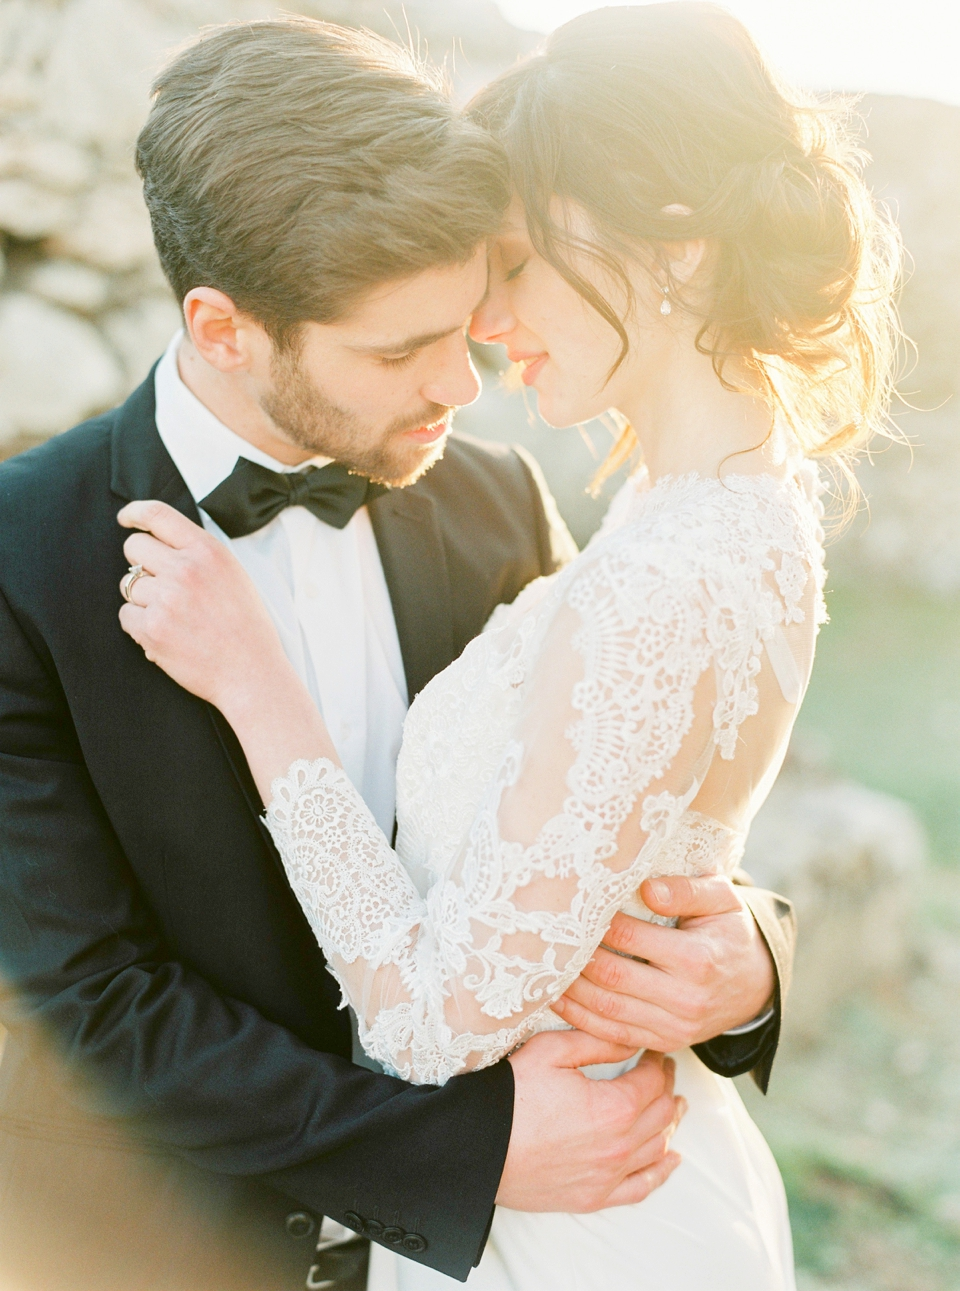 Love Is My Favorite Color - Portugal Wedding Photographer   Destination Wedding Photographer Europe